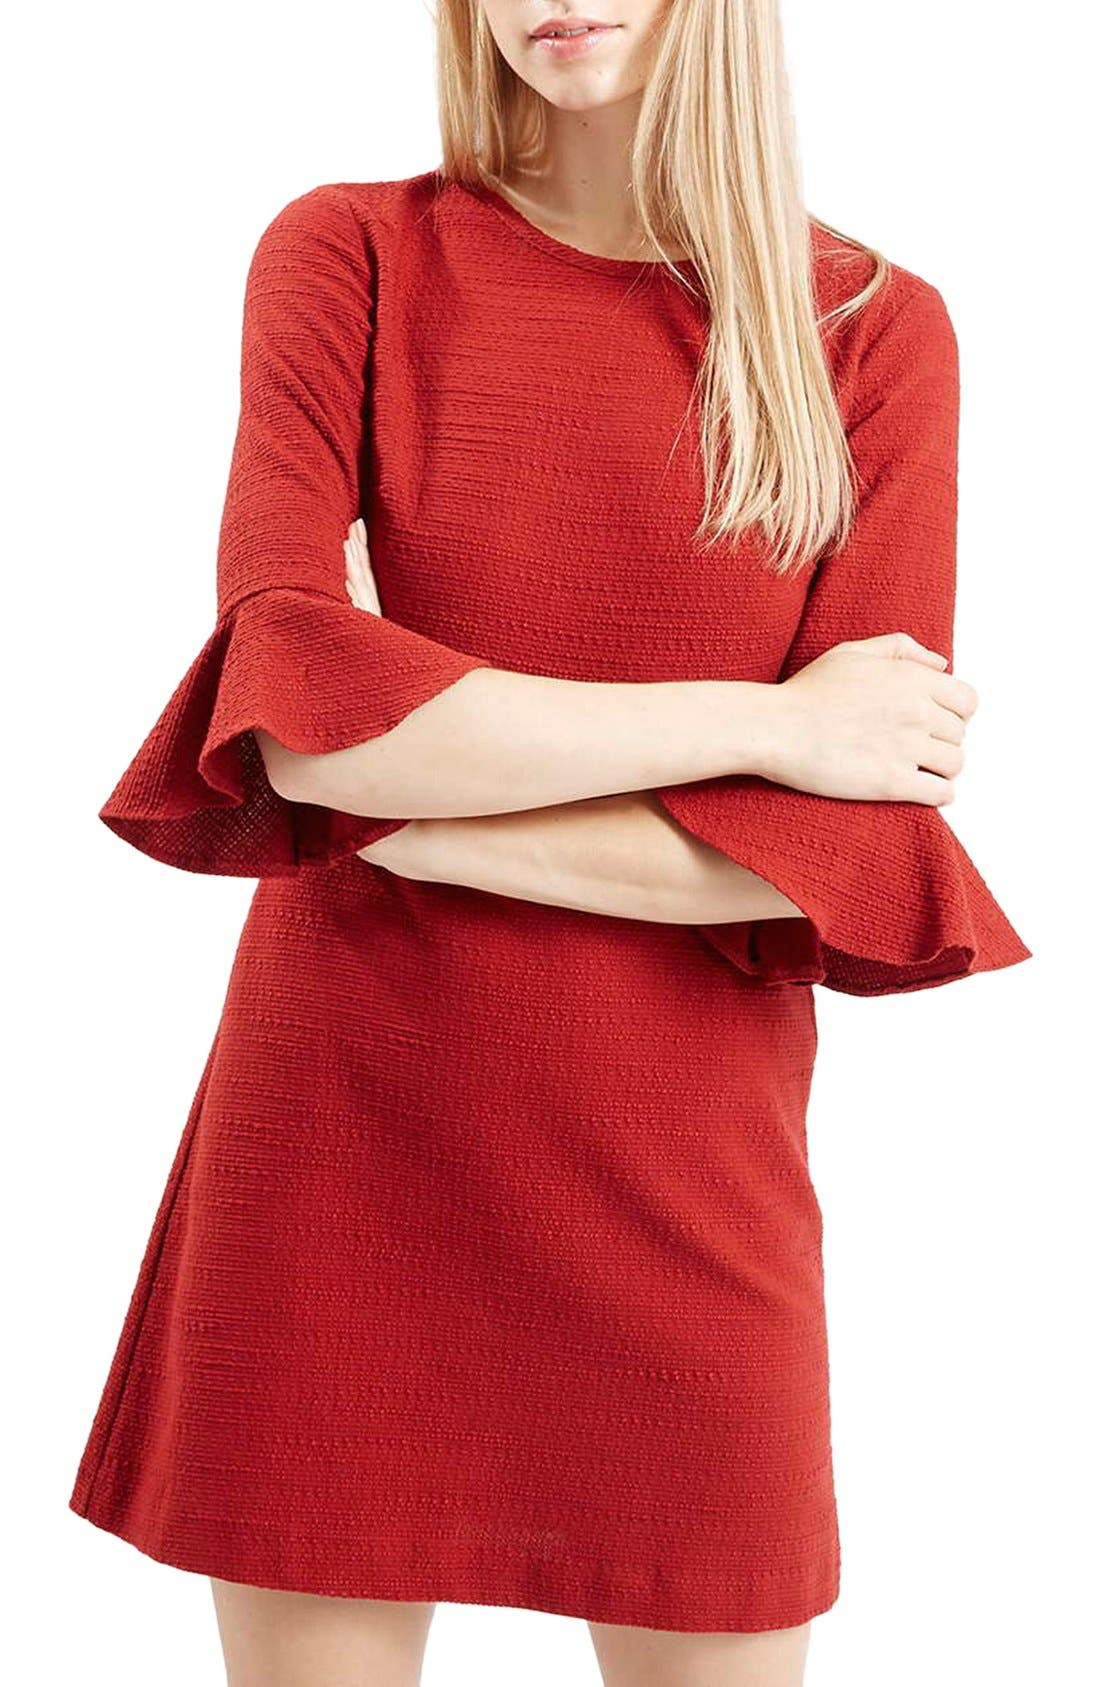 Alternate Image 1 Selected - Topshop Fluted Sleeve Dress (Regular & Petite)